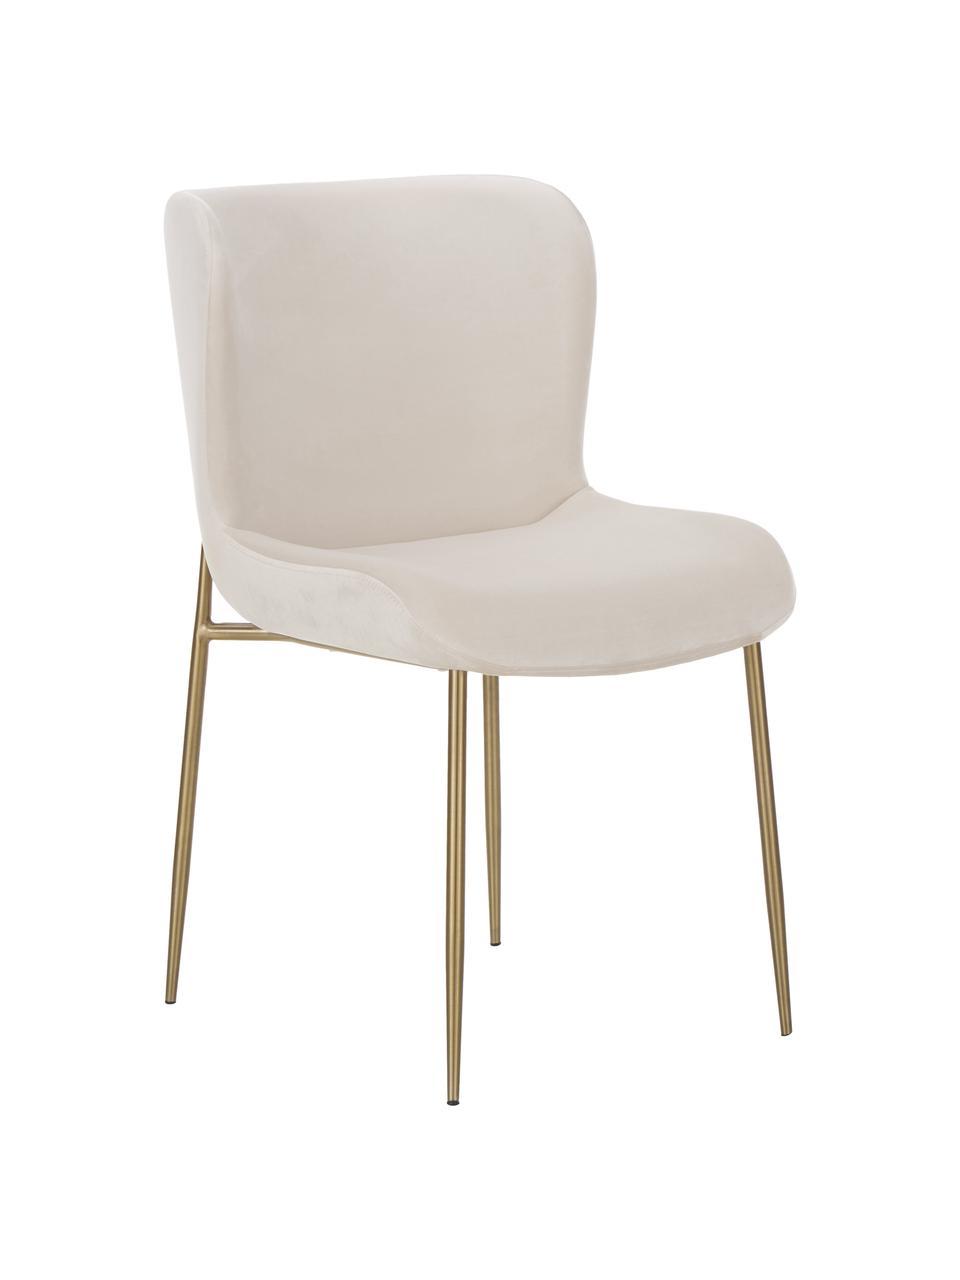 Chaise velours rembourrée Tess, Velours beige, pieds or